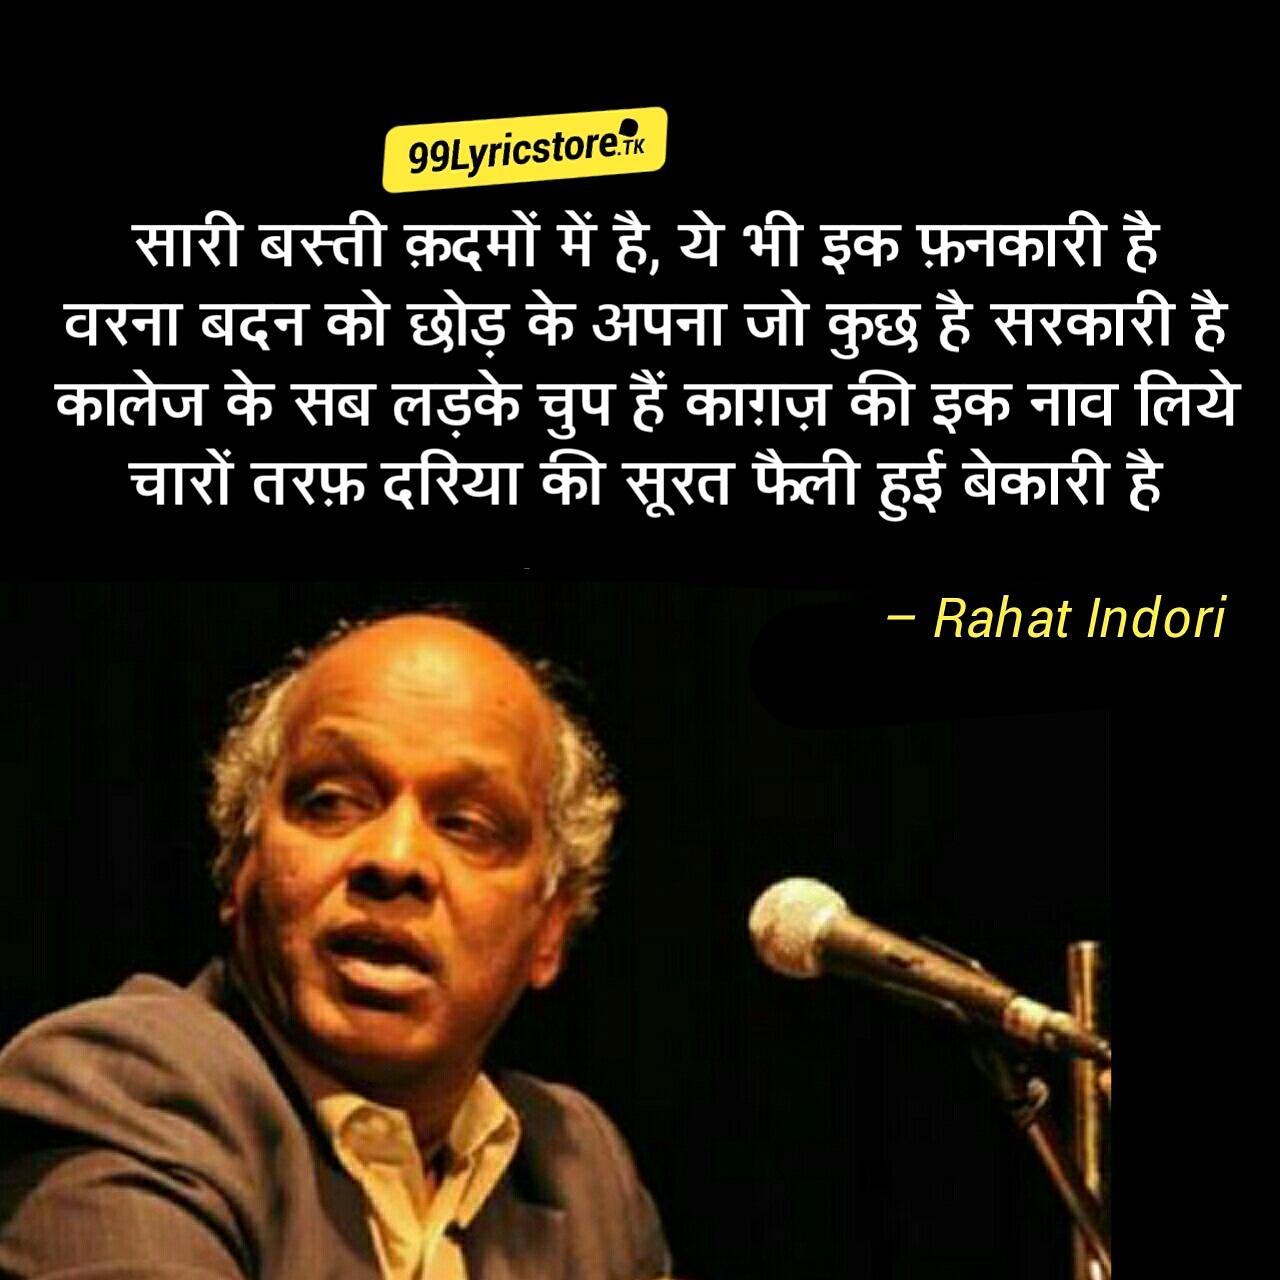 Sari Basti Kadmon Me Hai, Ye Bhi Ik Fankari Hai' written and performed by Rahat Indori. This poetry is best Ghazal and Shayari of Rahat Indori.